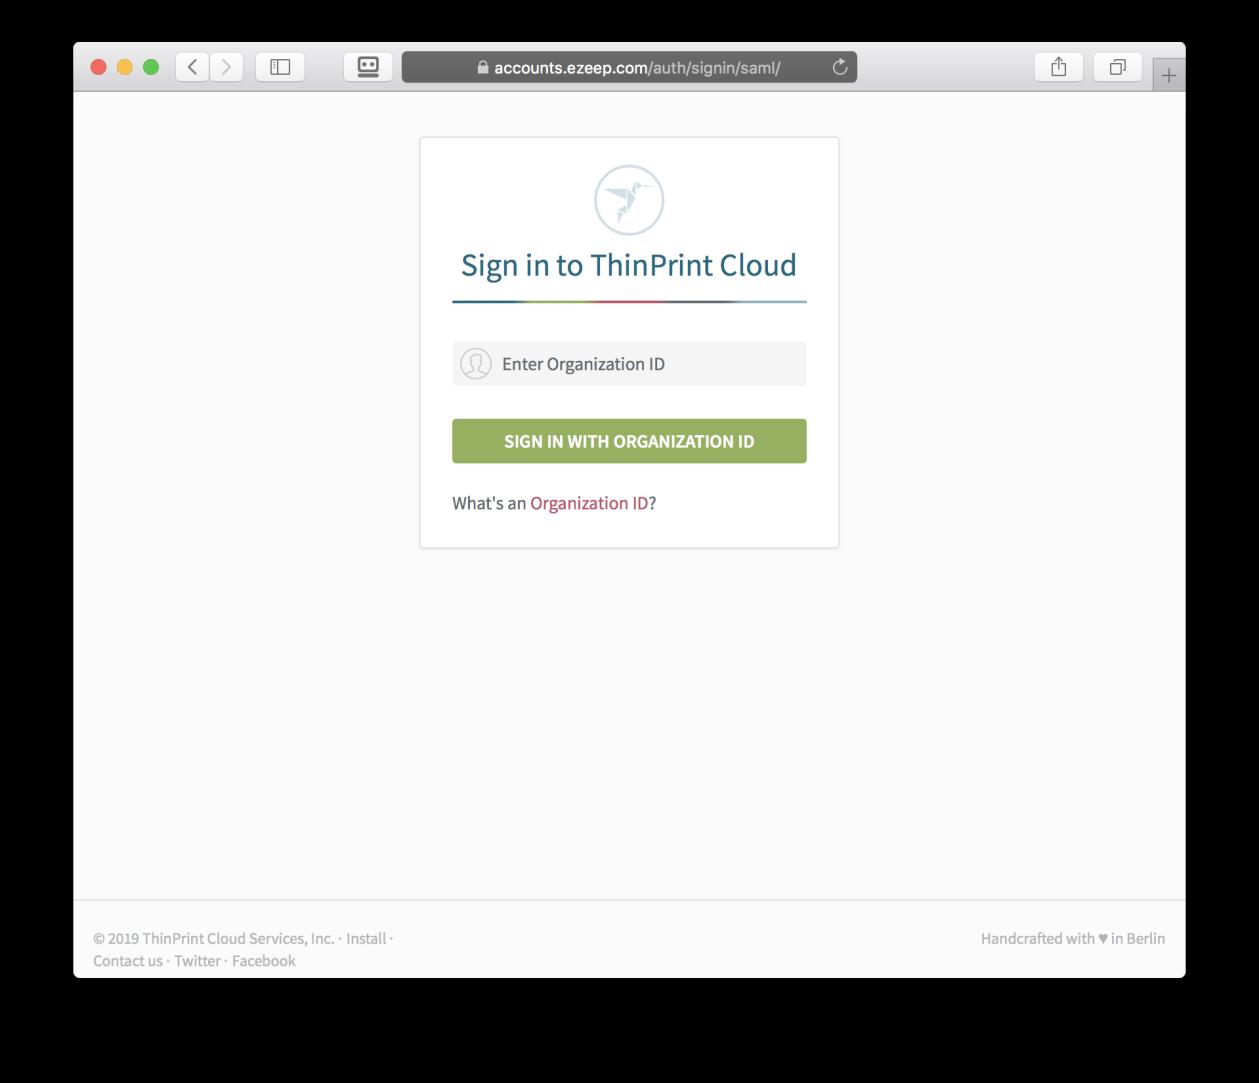 screenshot: sign in to ezeep with organization ID